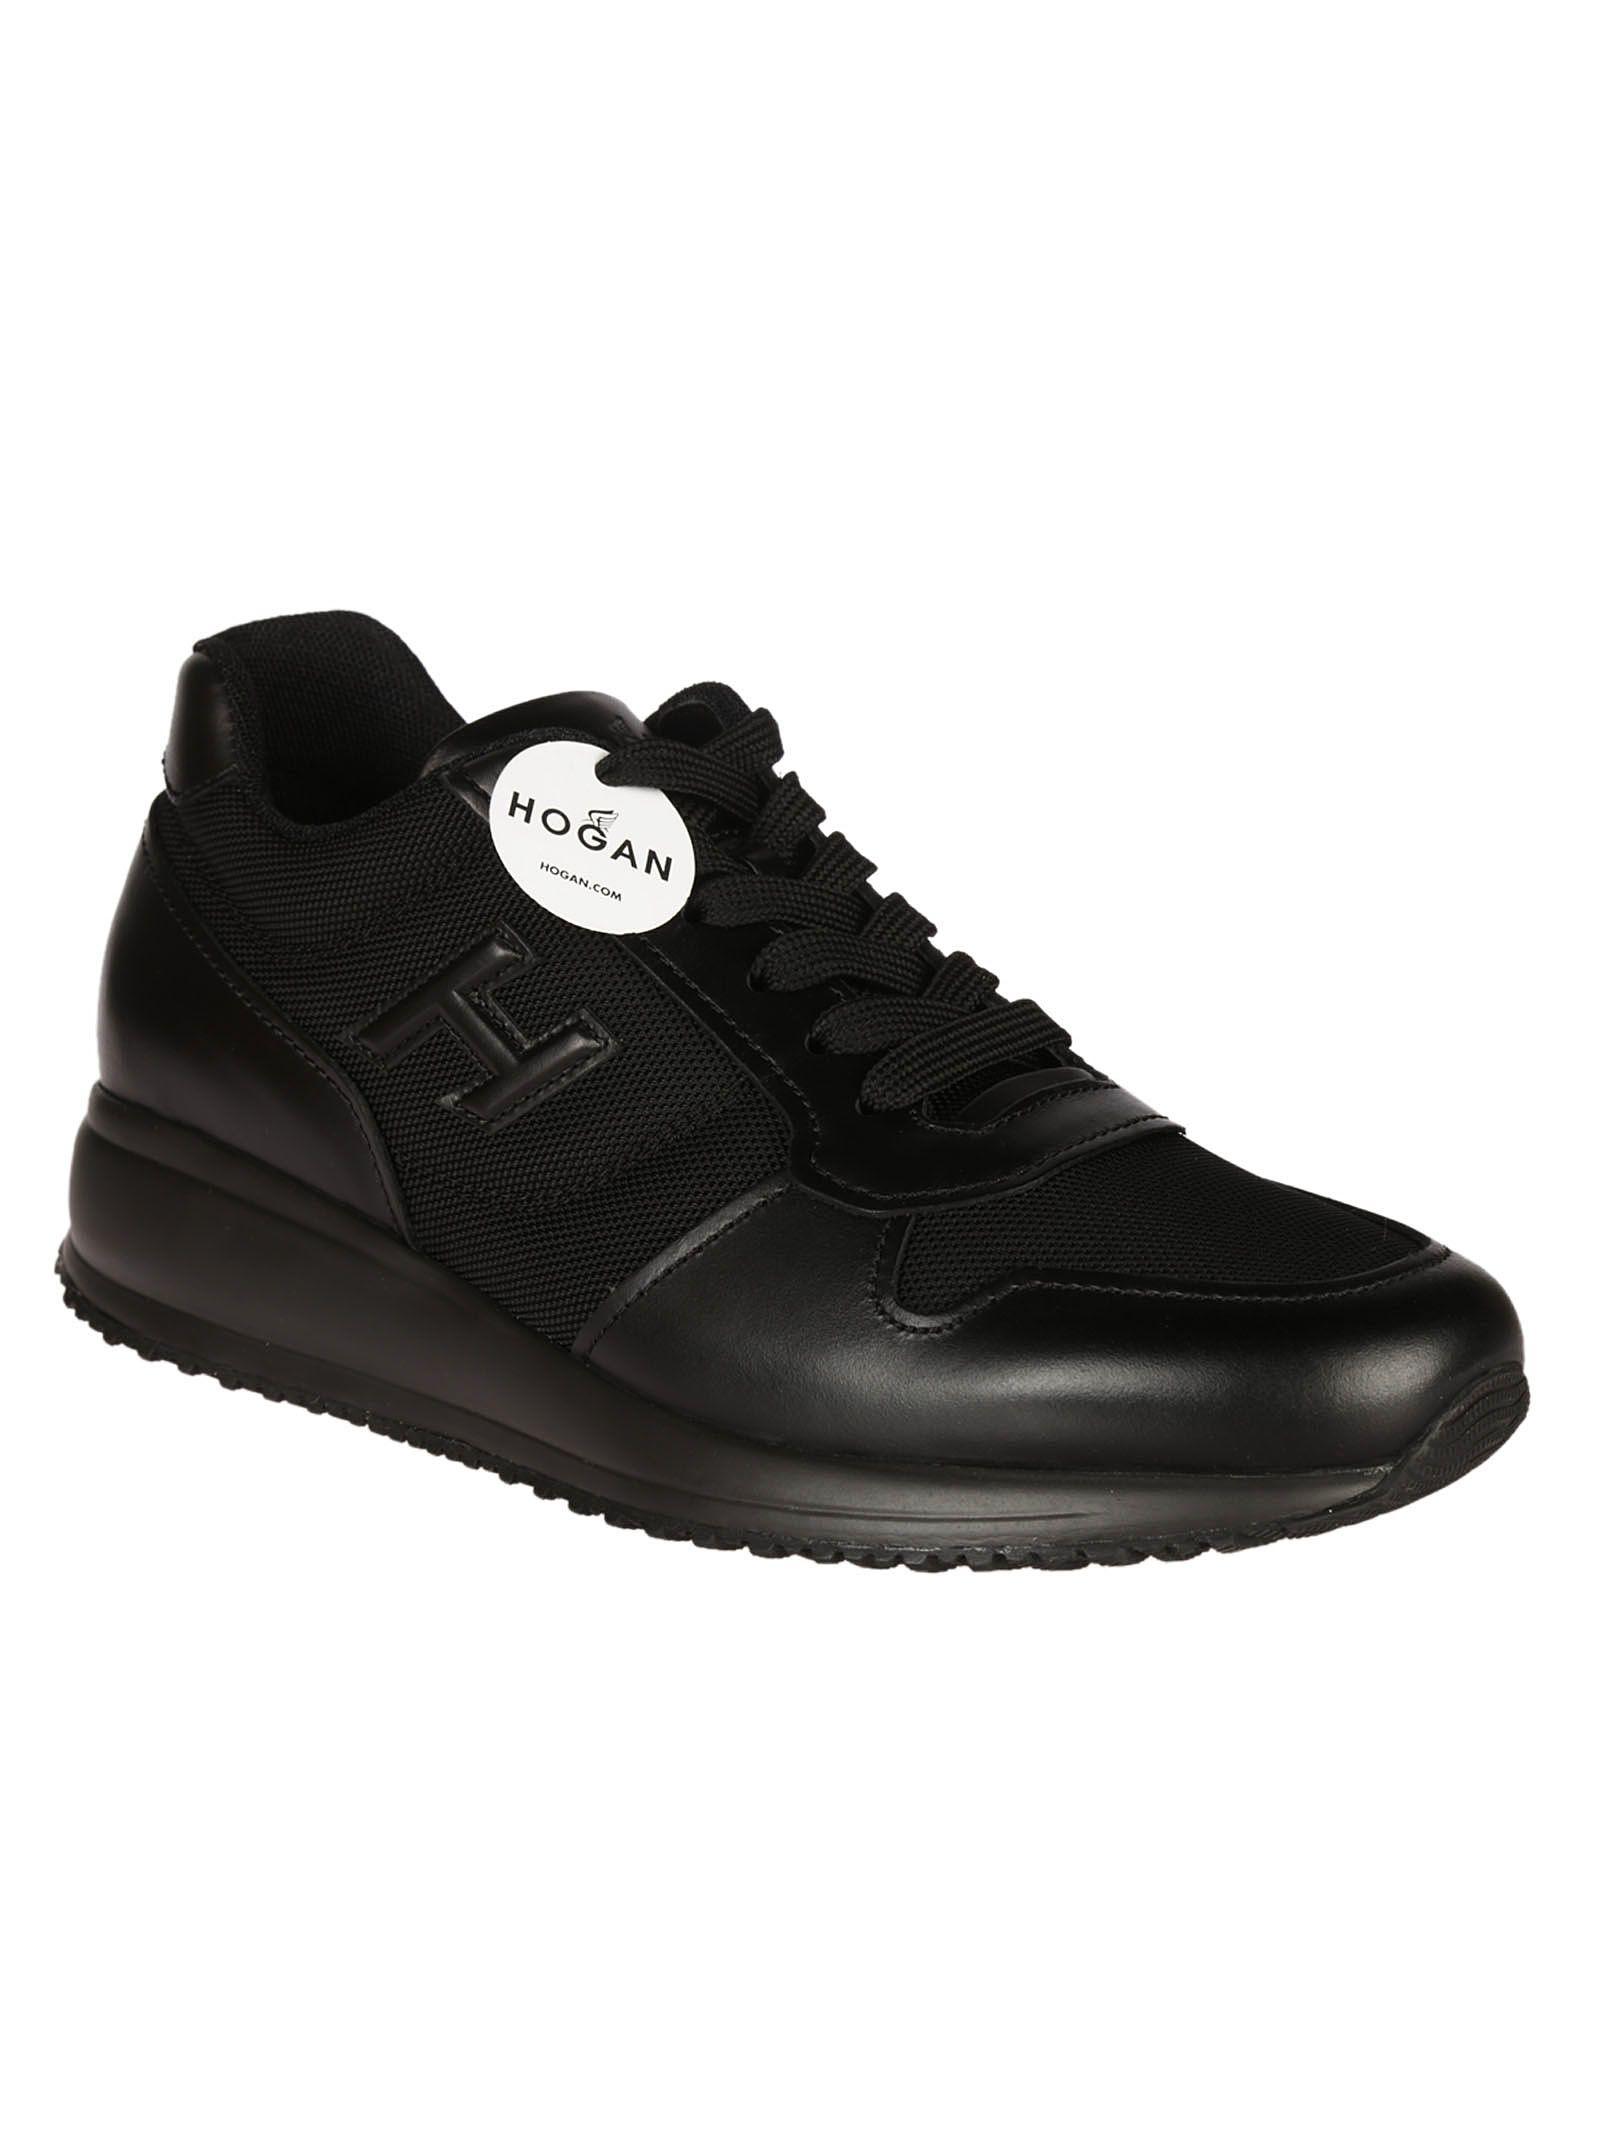 Hogan Interactive N20 Sneakers - Black Hogan Interactive N20 Sneakers -  Black ... dfd35a1fdee